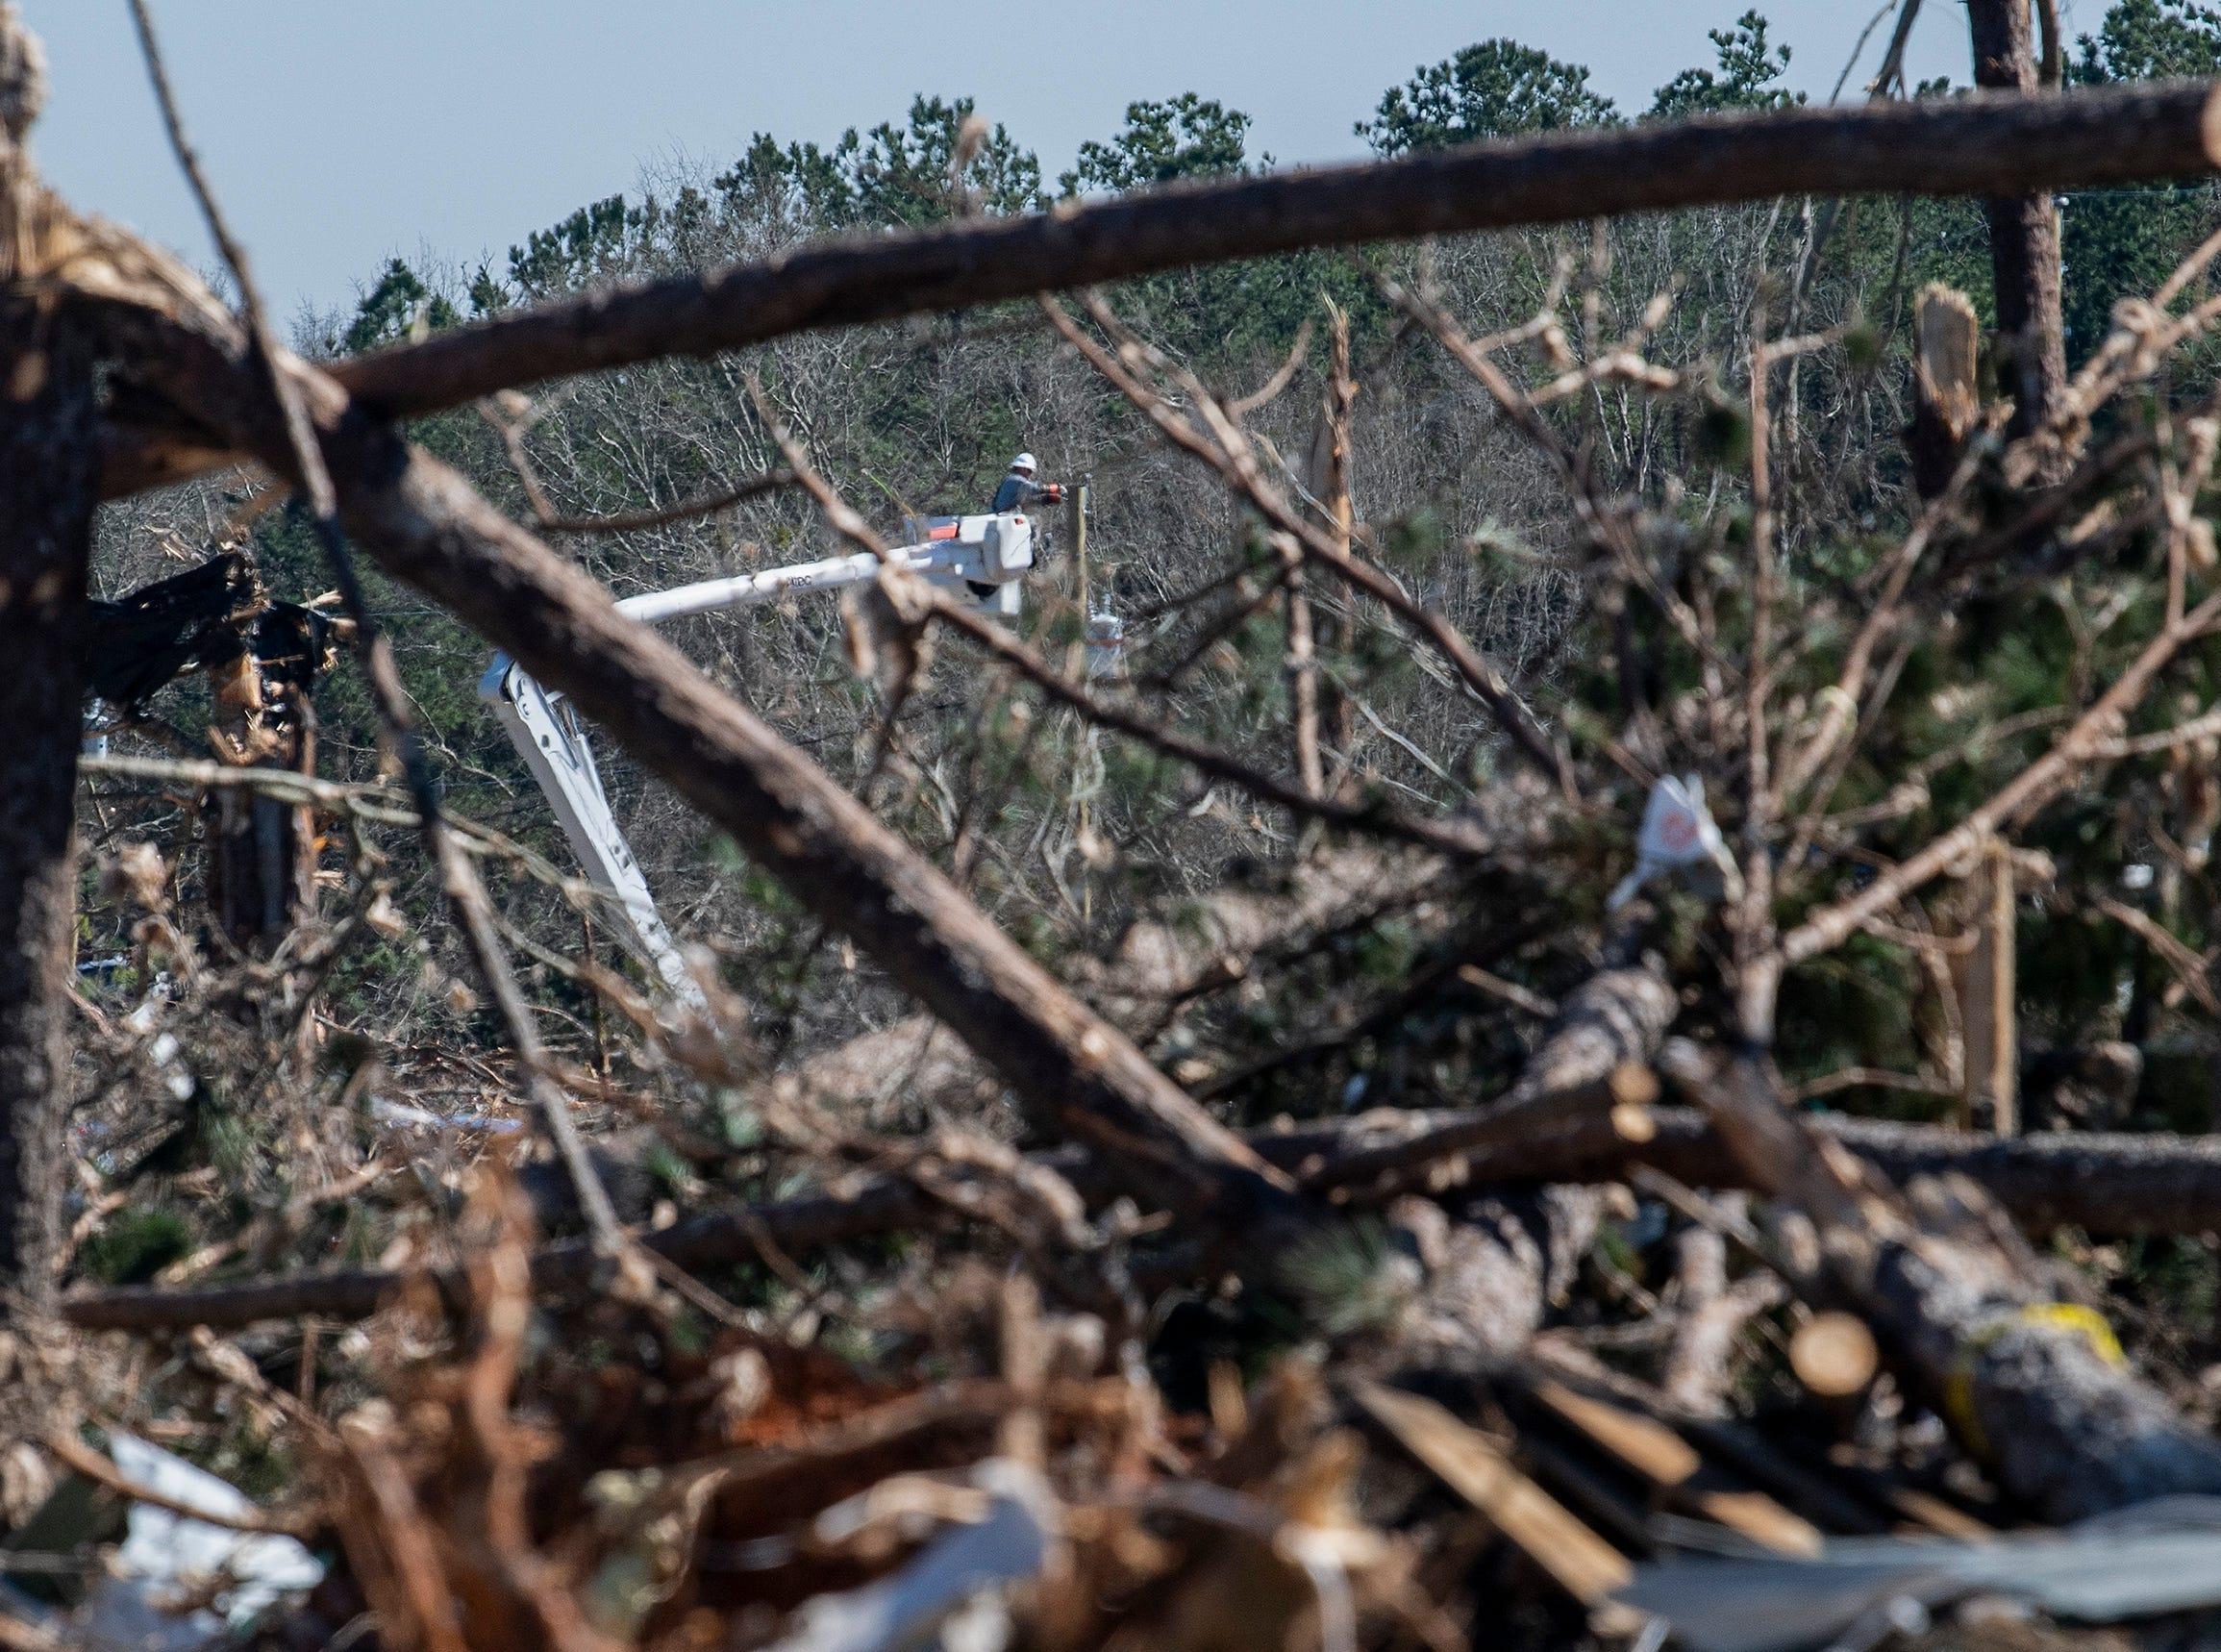 Lineman repair power lines among tornado damage in Beauregard, Ala. on  March 6, 2019.